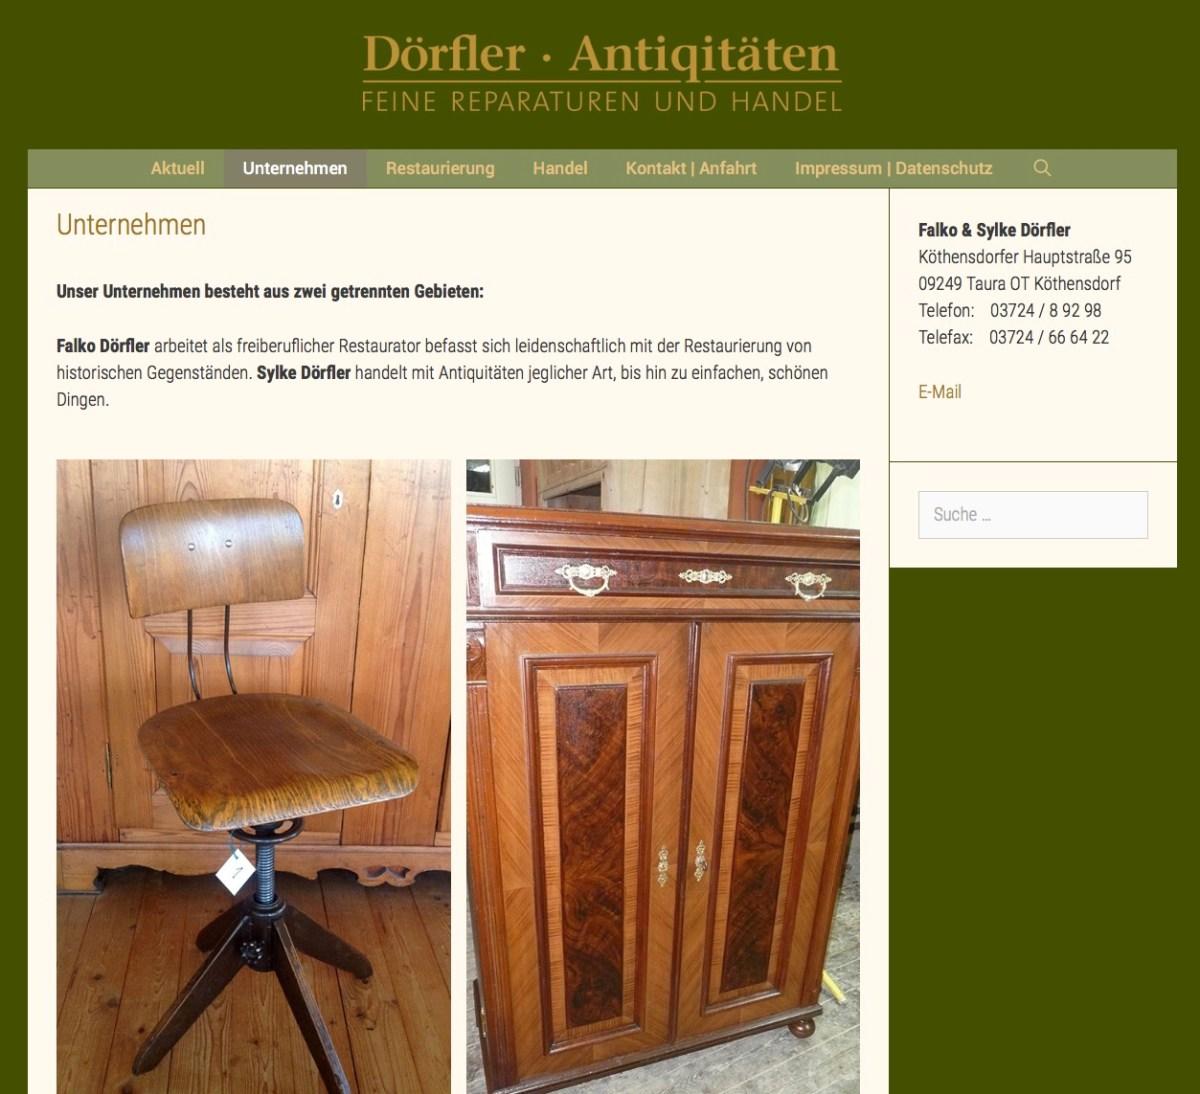 Dörfler · Antiquitäten